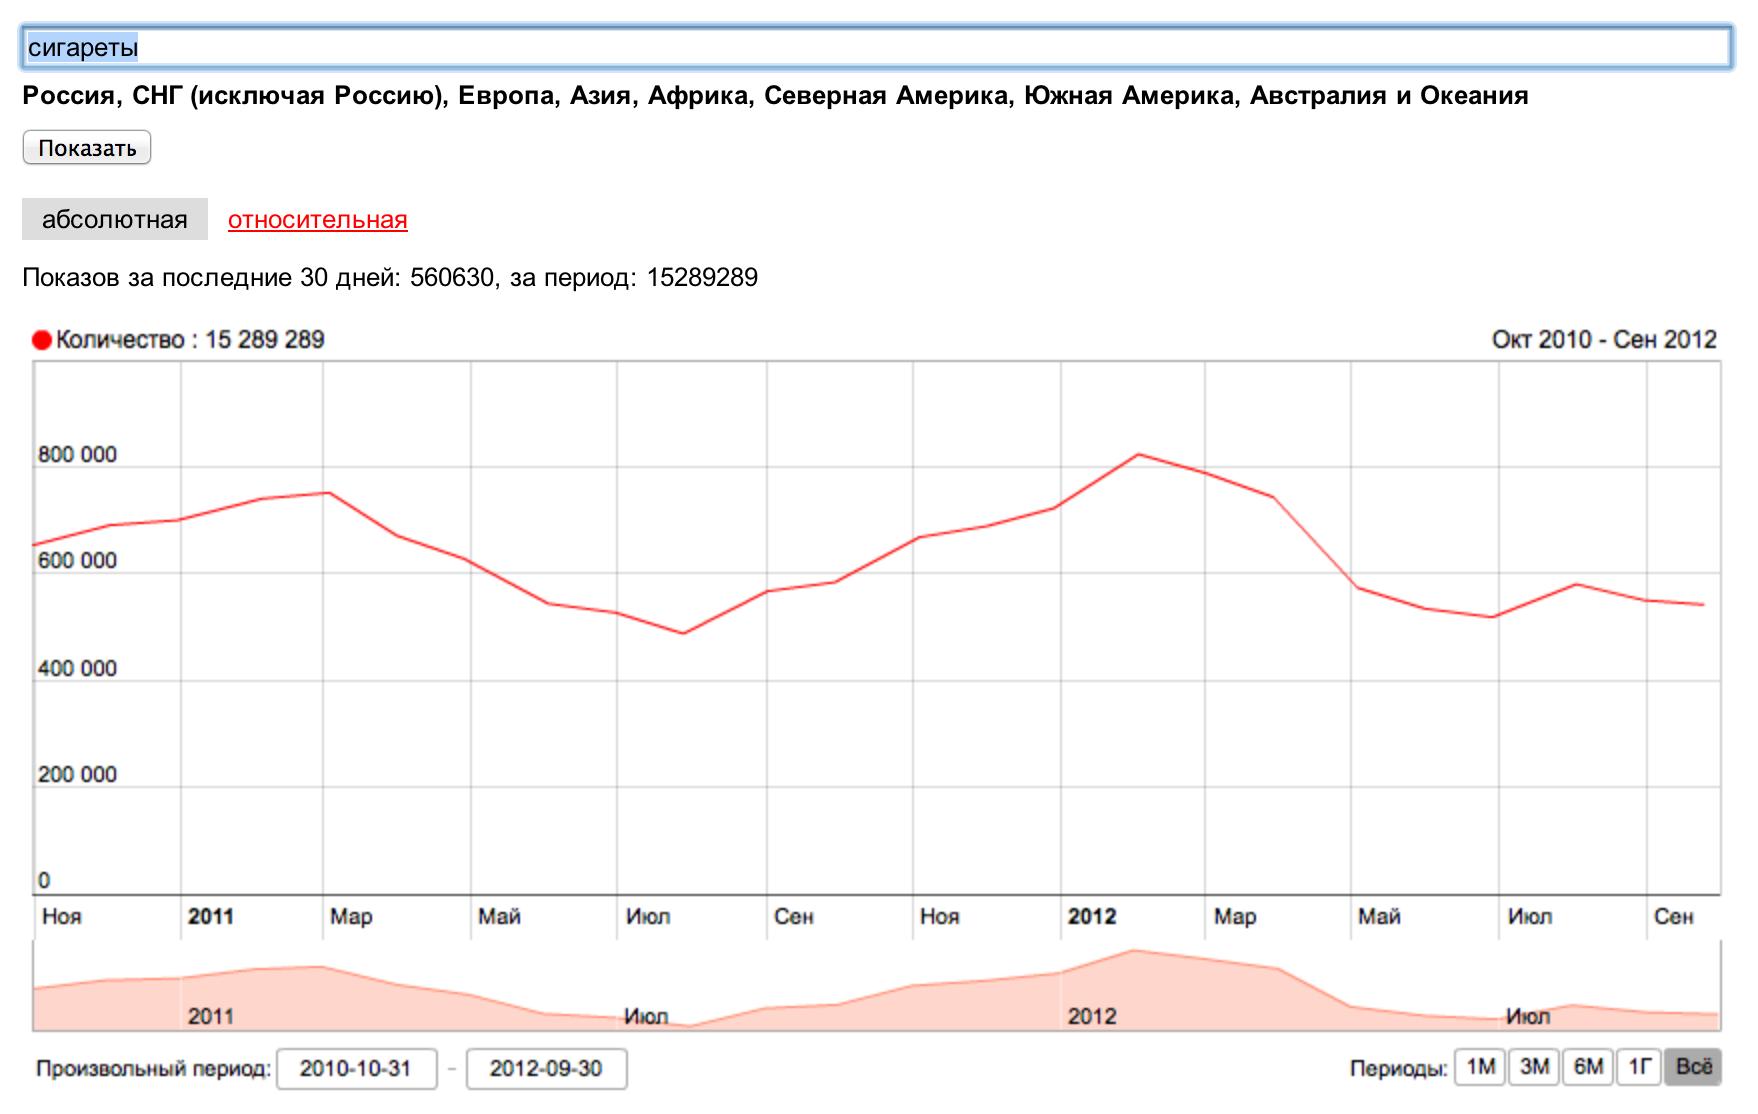 Снимок экрана 2012-11-05 в 20.32.29